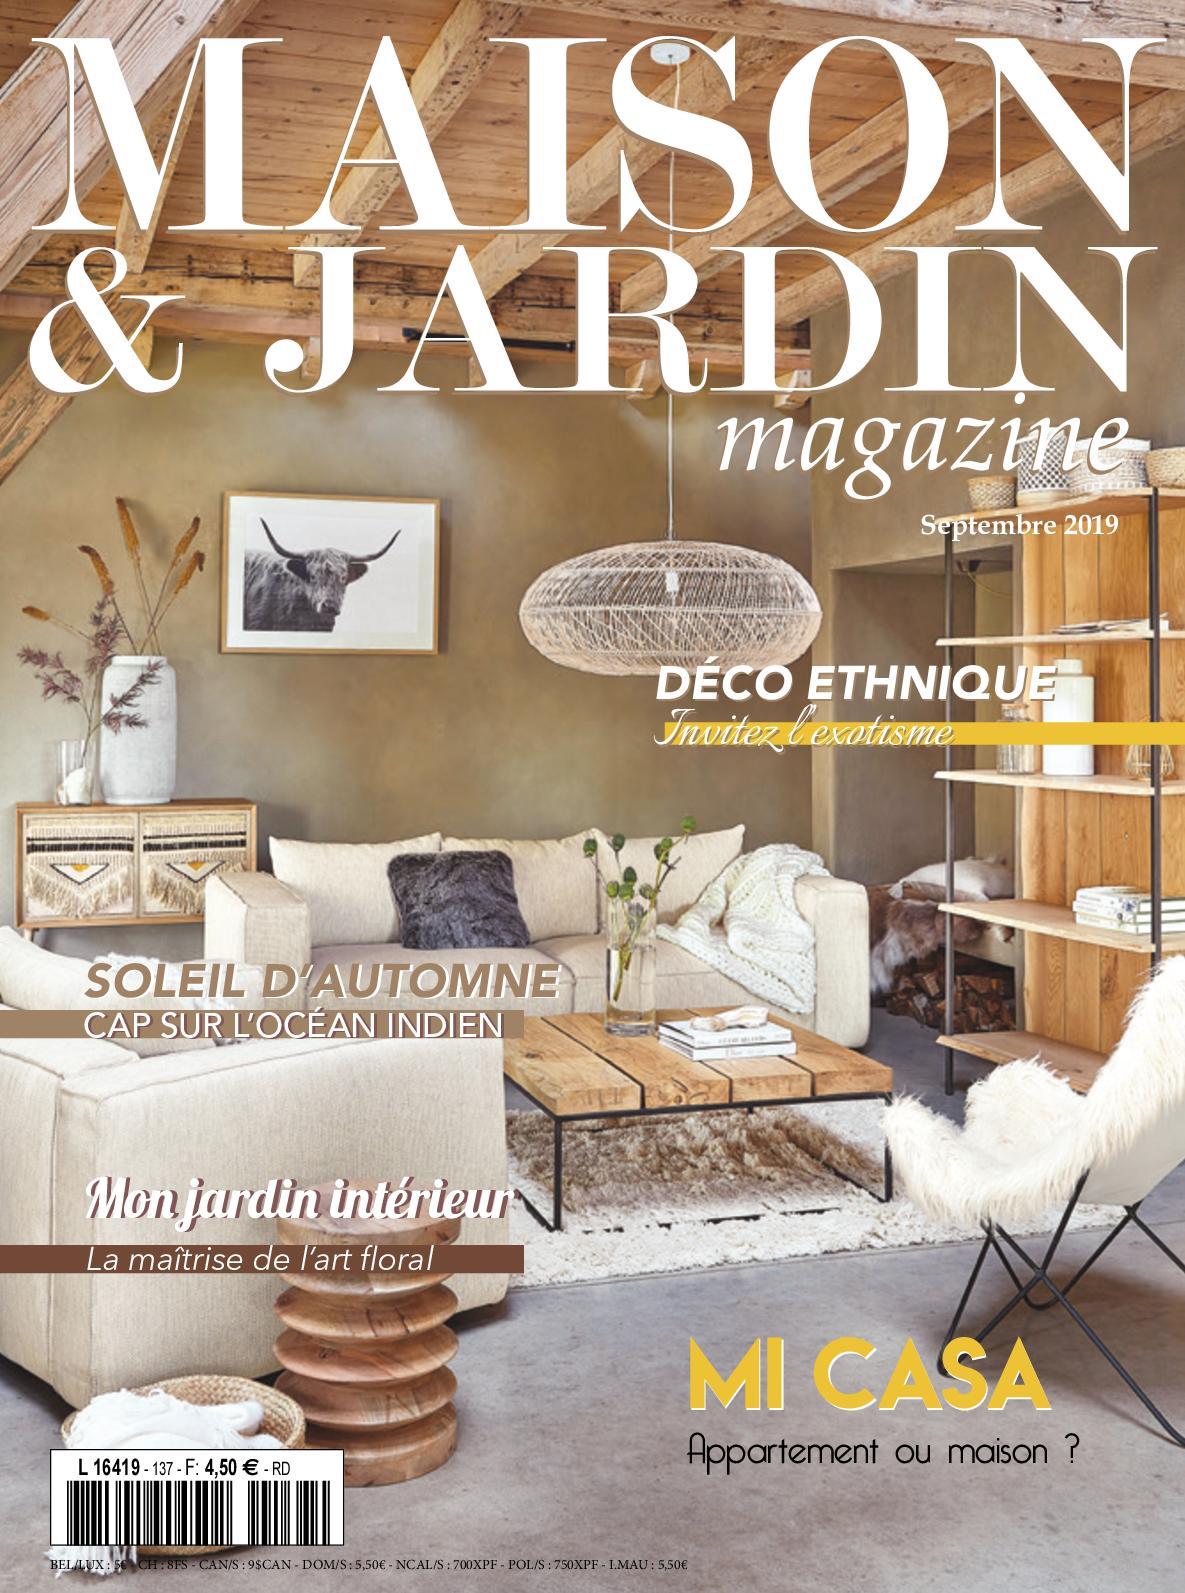 Calaméo Maison Jardin Magazine 137 Extrait